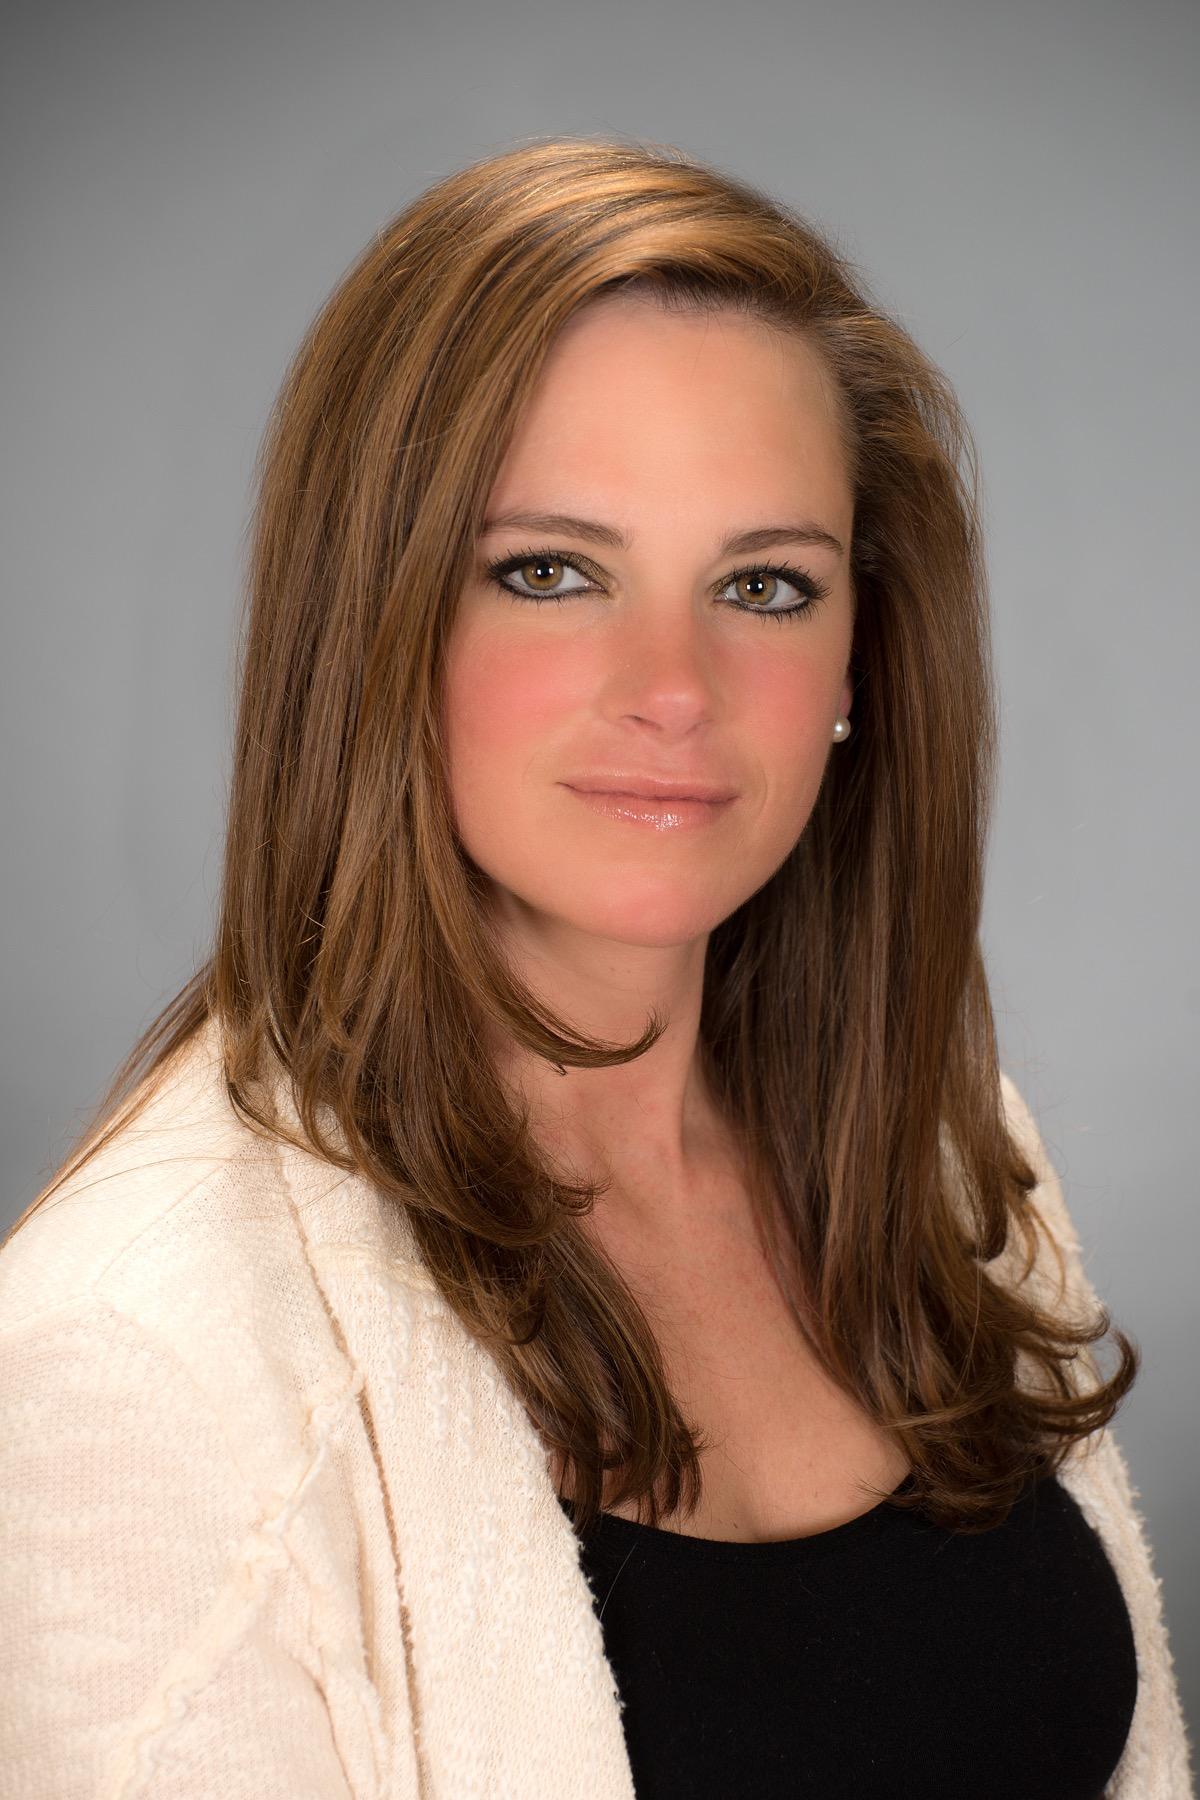 Meredith Lockhart